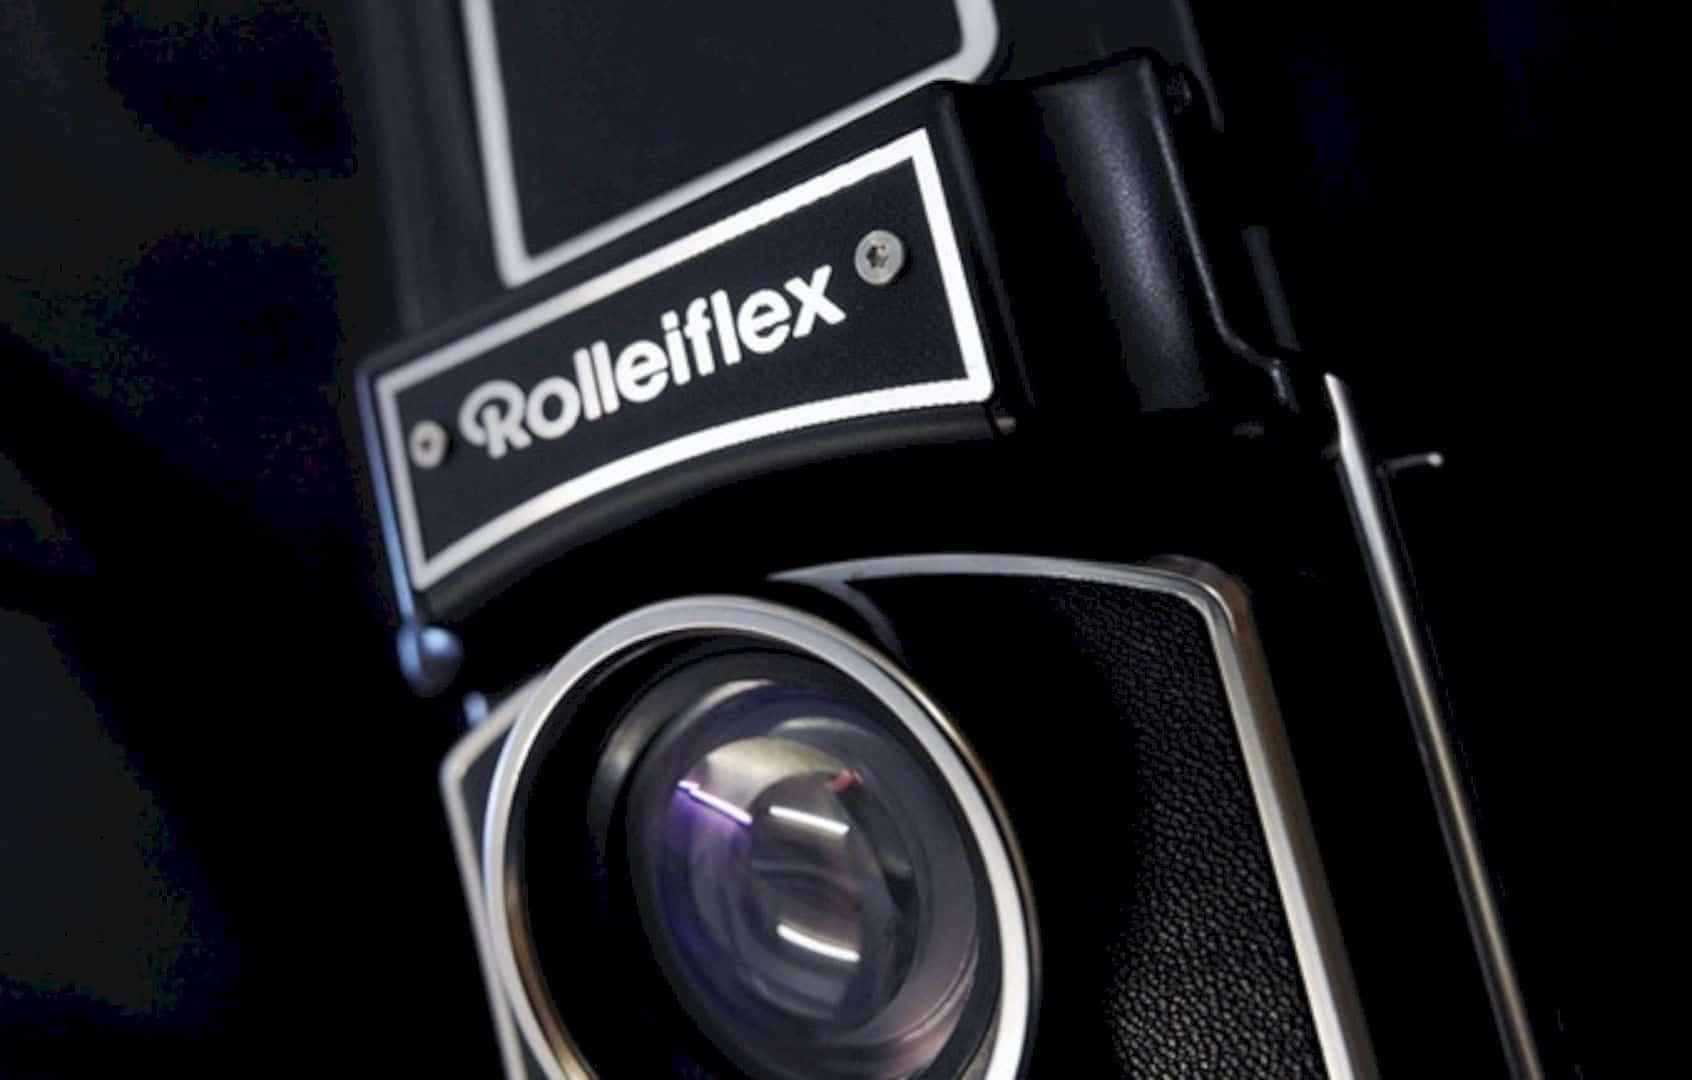 Rolleiflex™ Instant Kamera: The legendary Twin Lens Rebuild in Modern Features